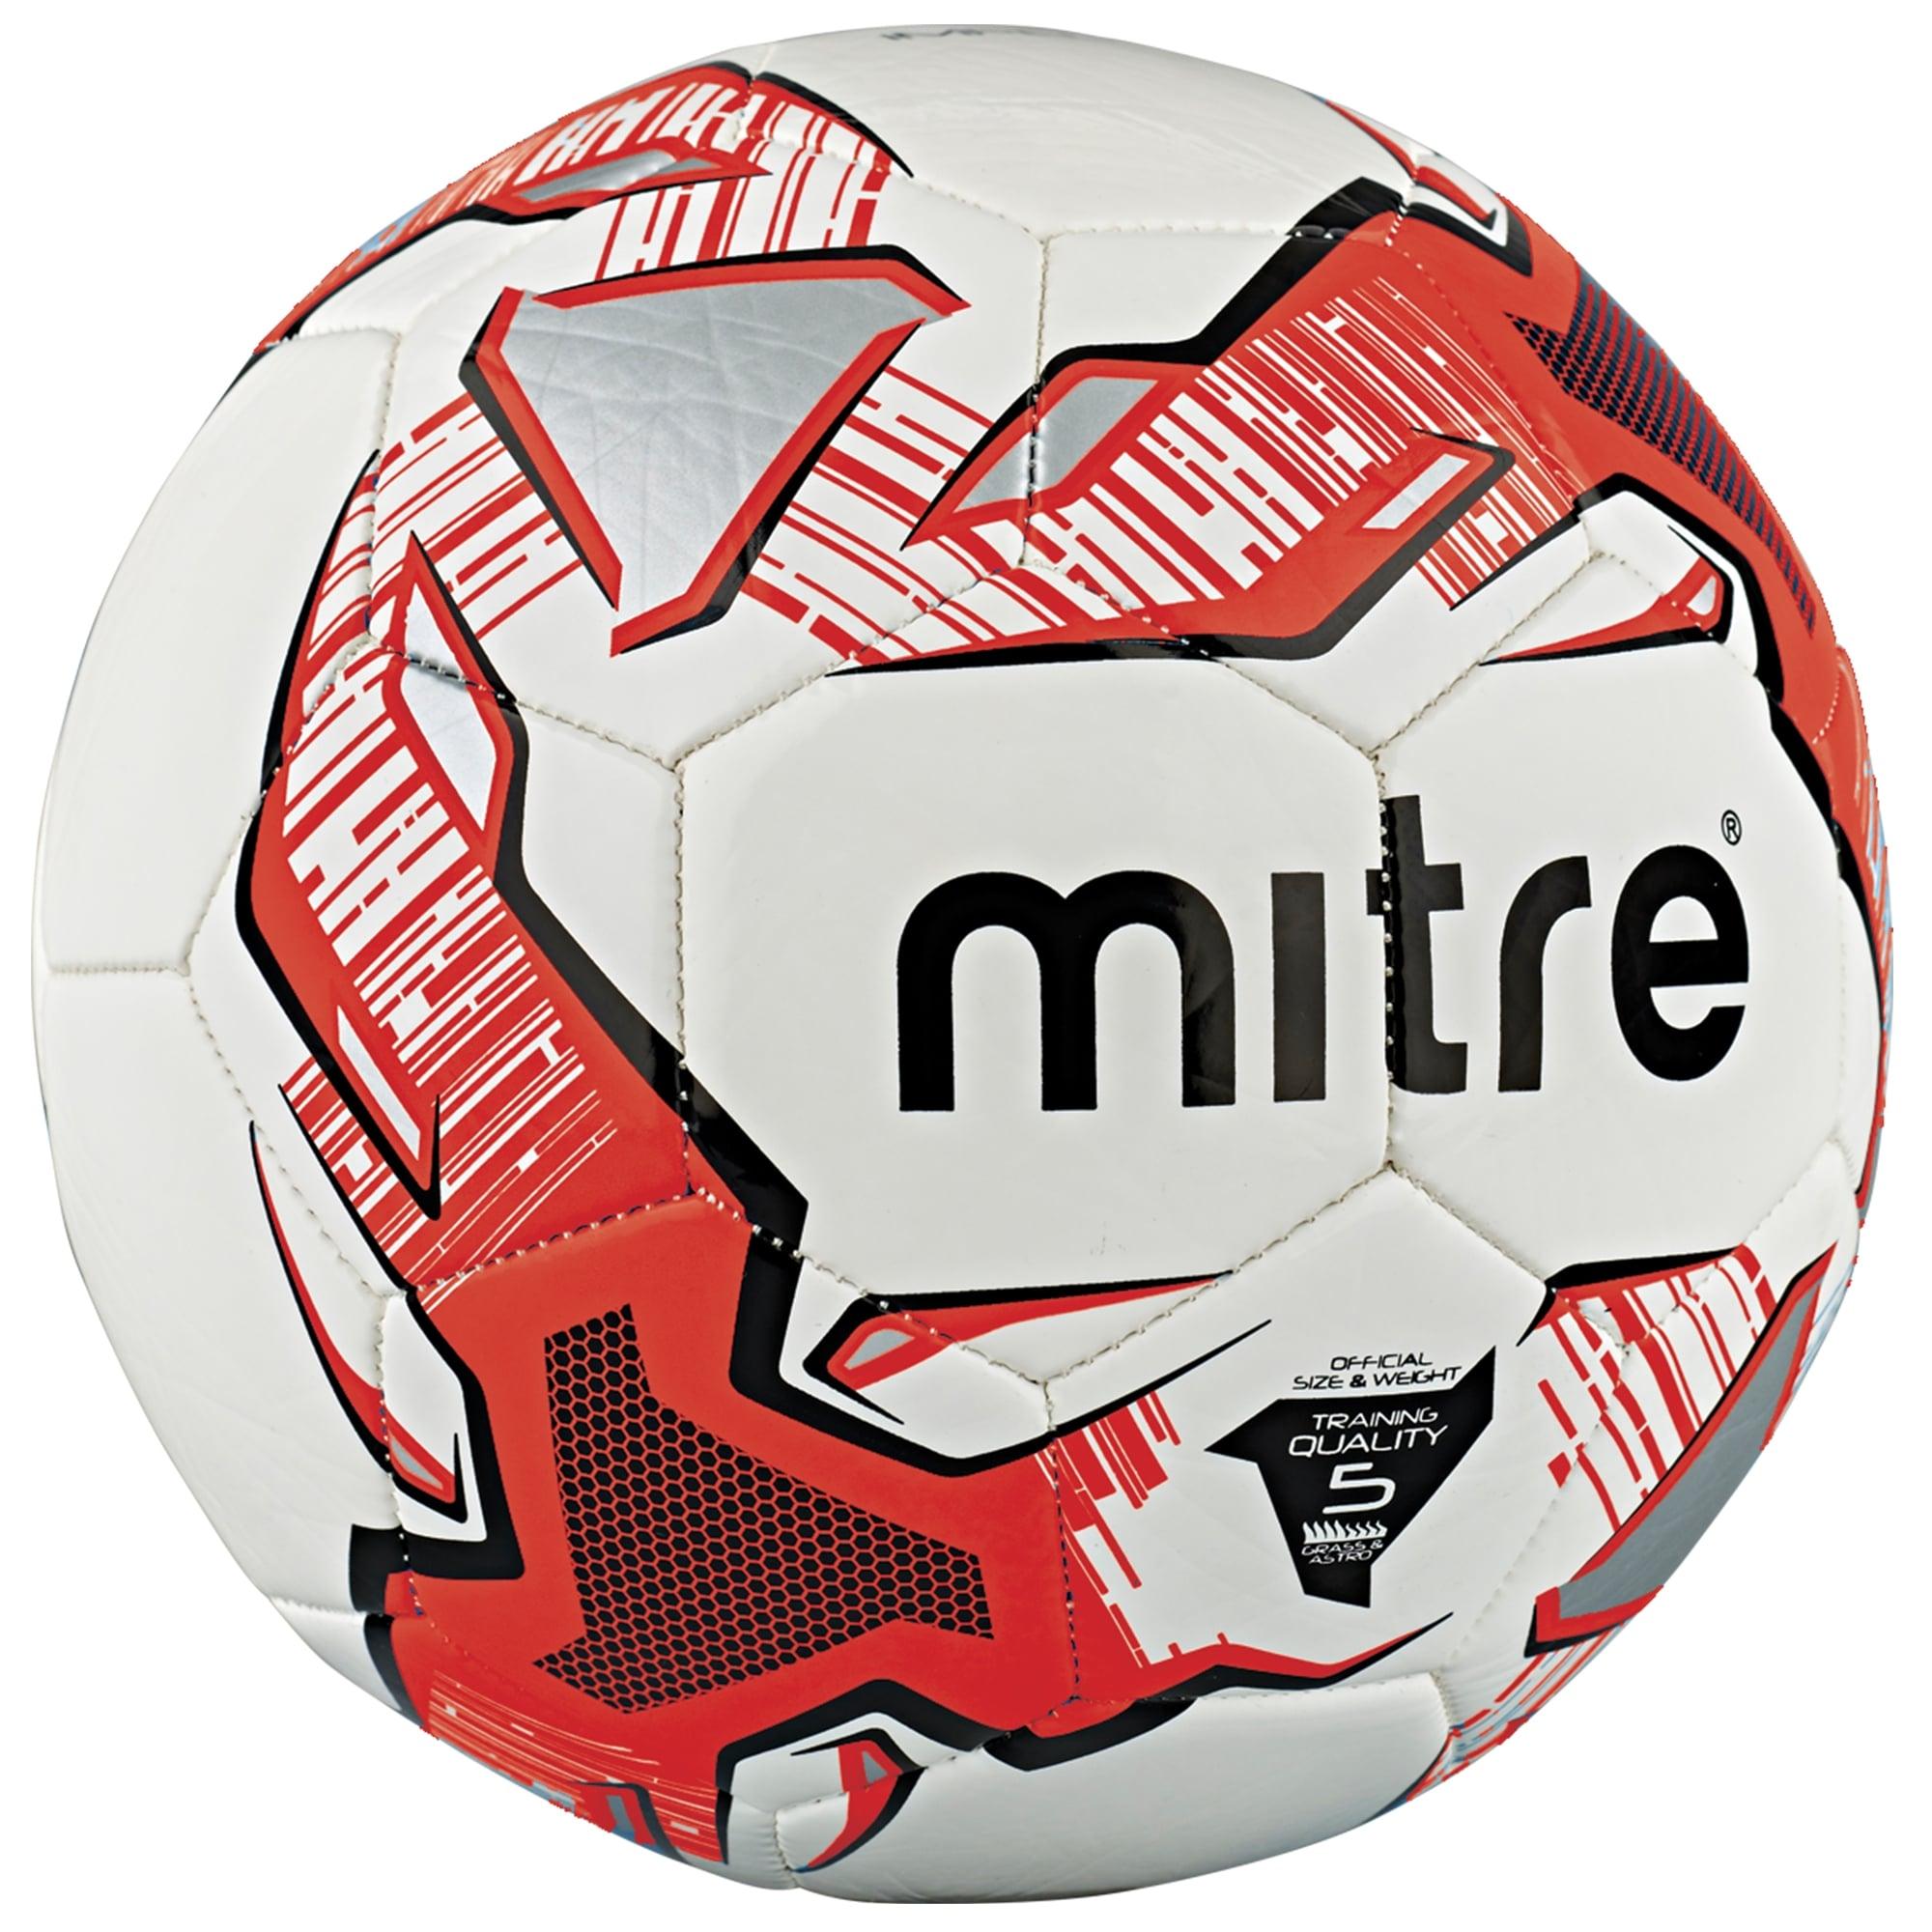 Mitre Impel Max Plus Training Football Ball Size 3,4,5 ✅ FREE UK SHIPPING ✅